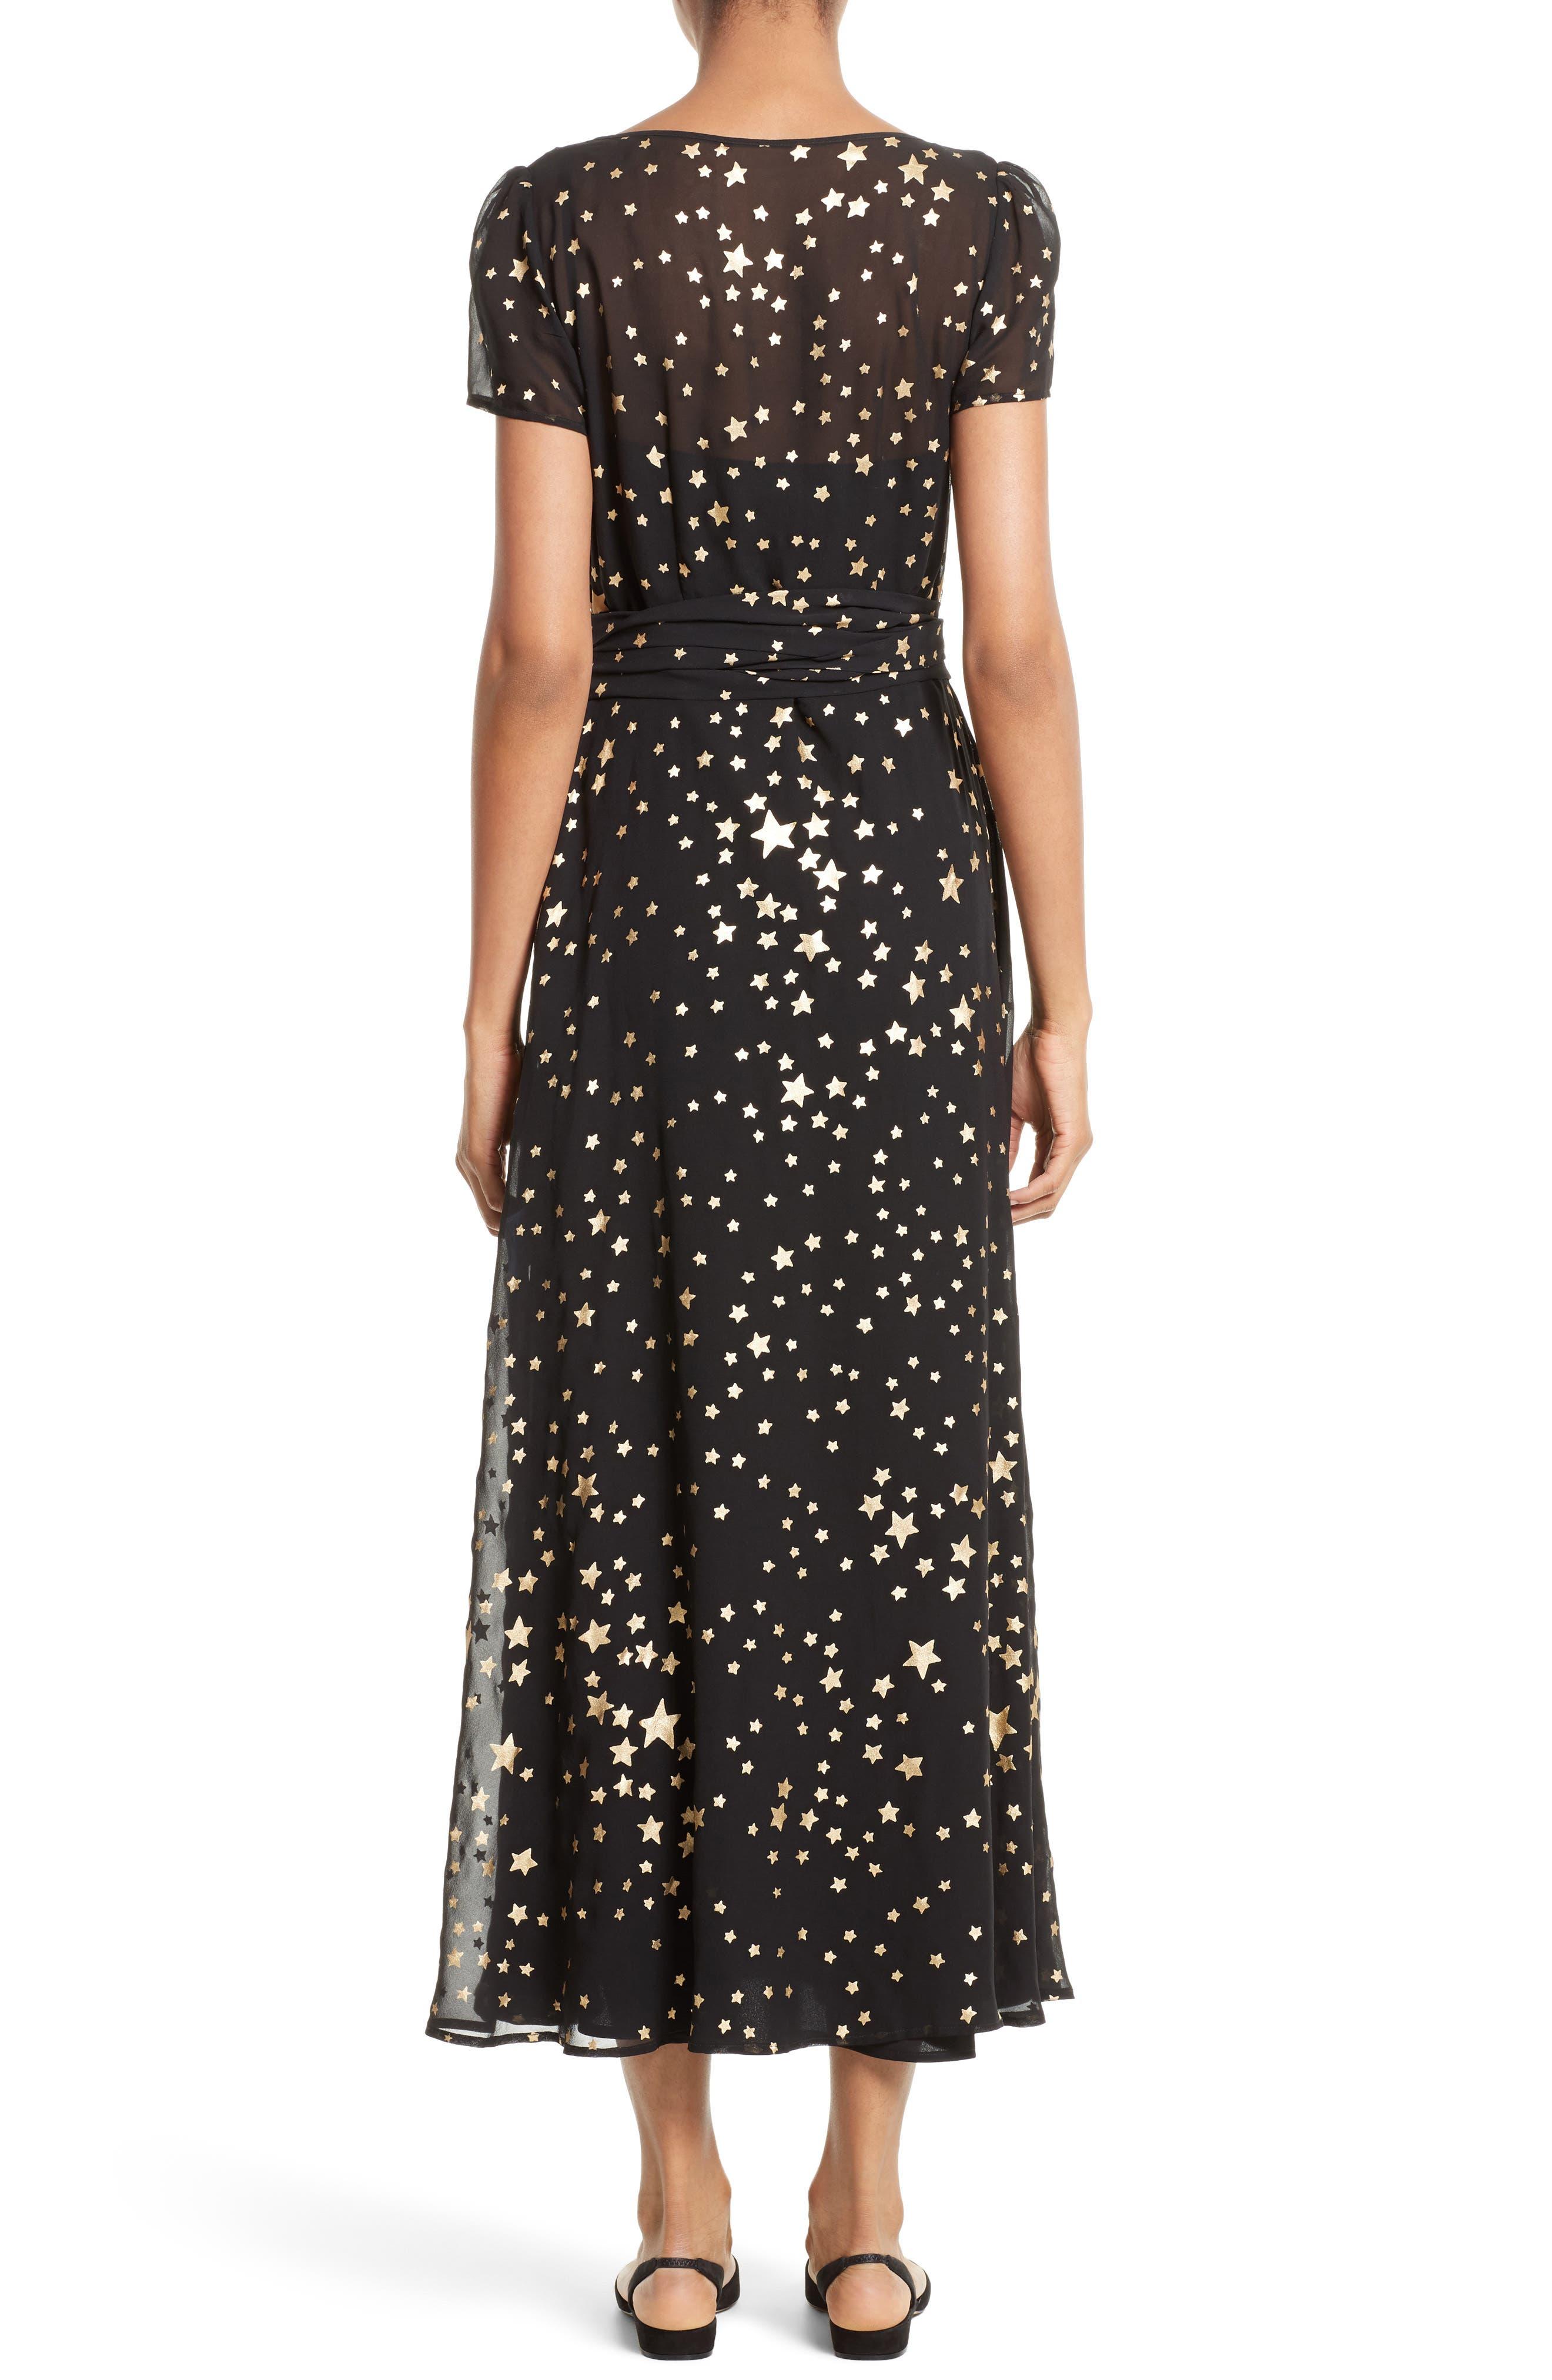 RED VALENTINO, Lamé Star Wrap Maxi Dress, Alternate thumbnail 2, color, 001